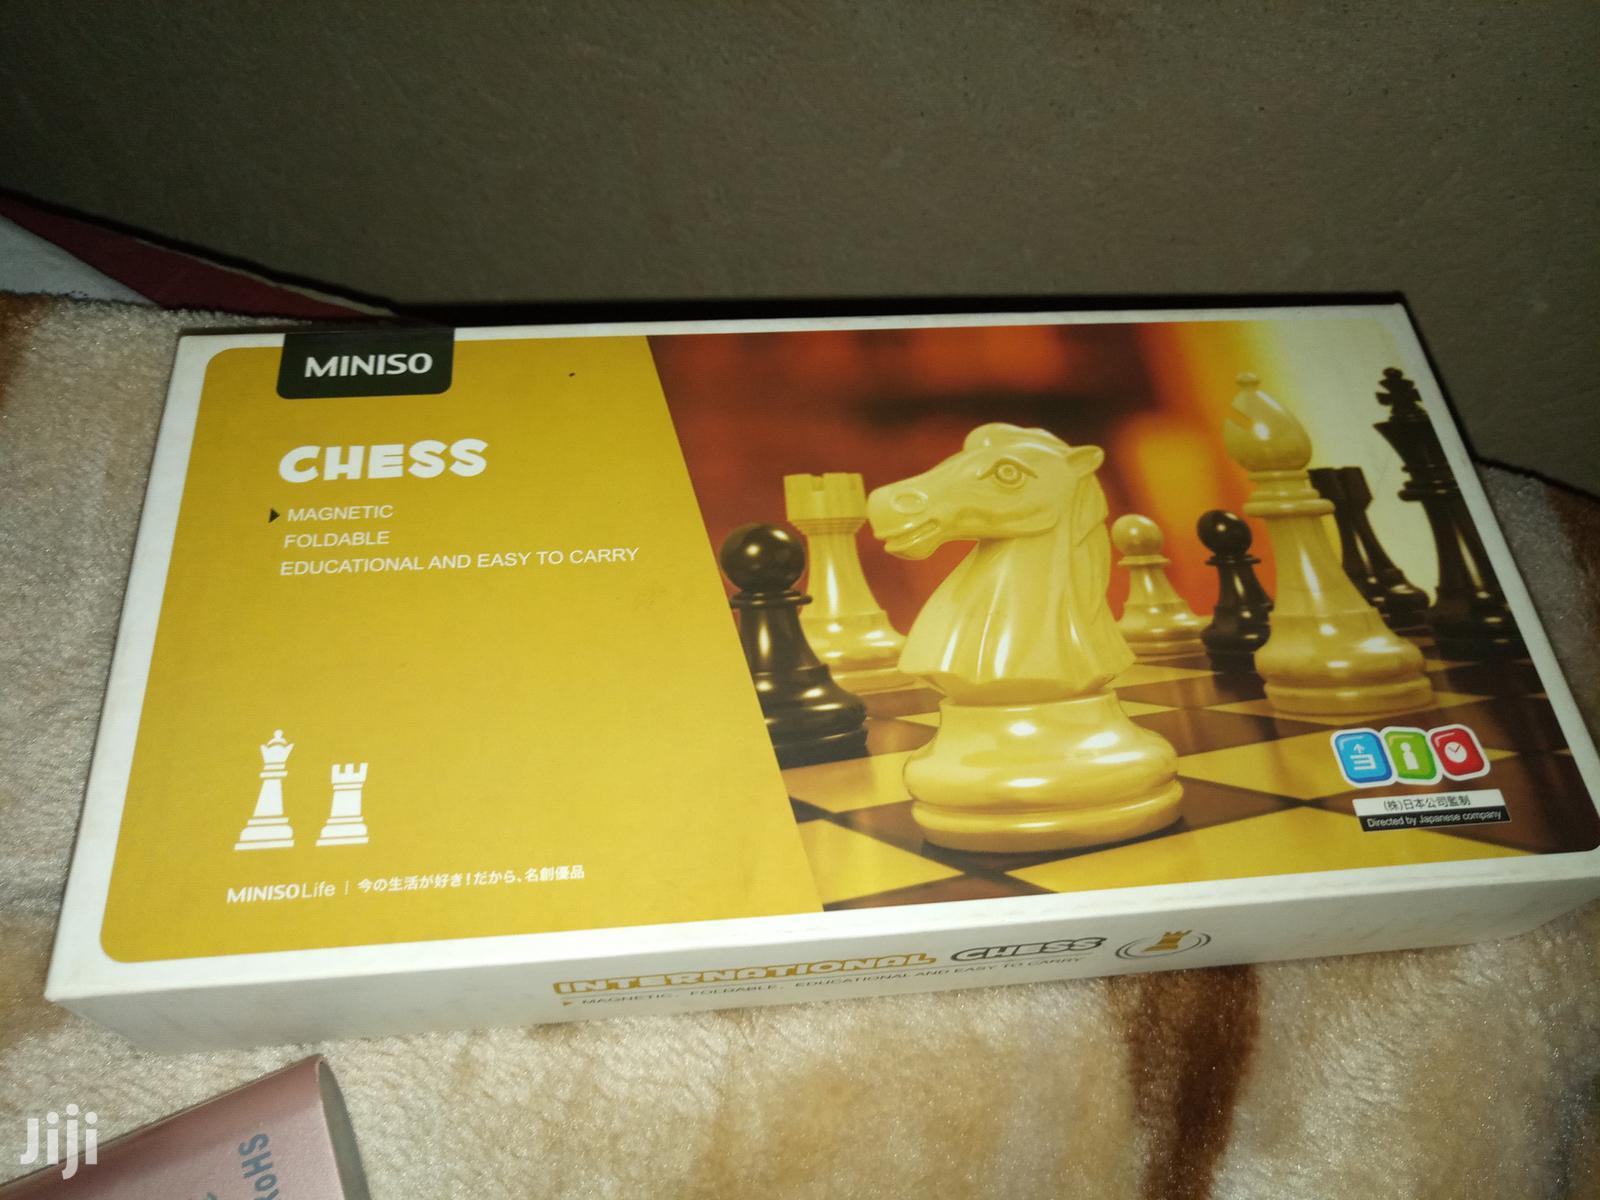 Archive: Portable Chess Board